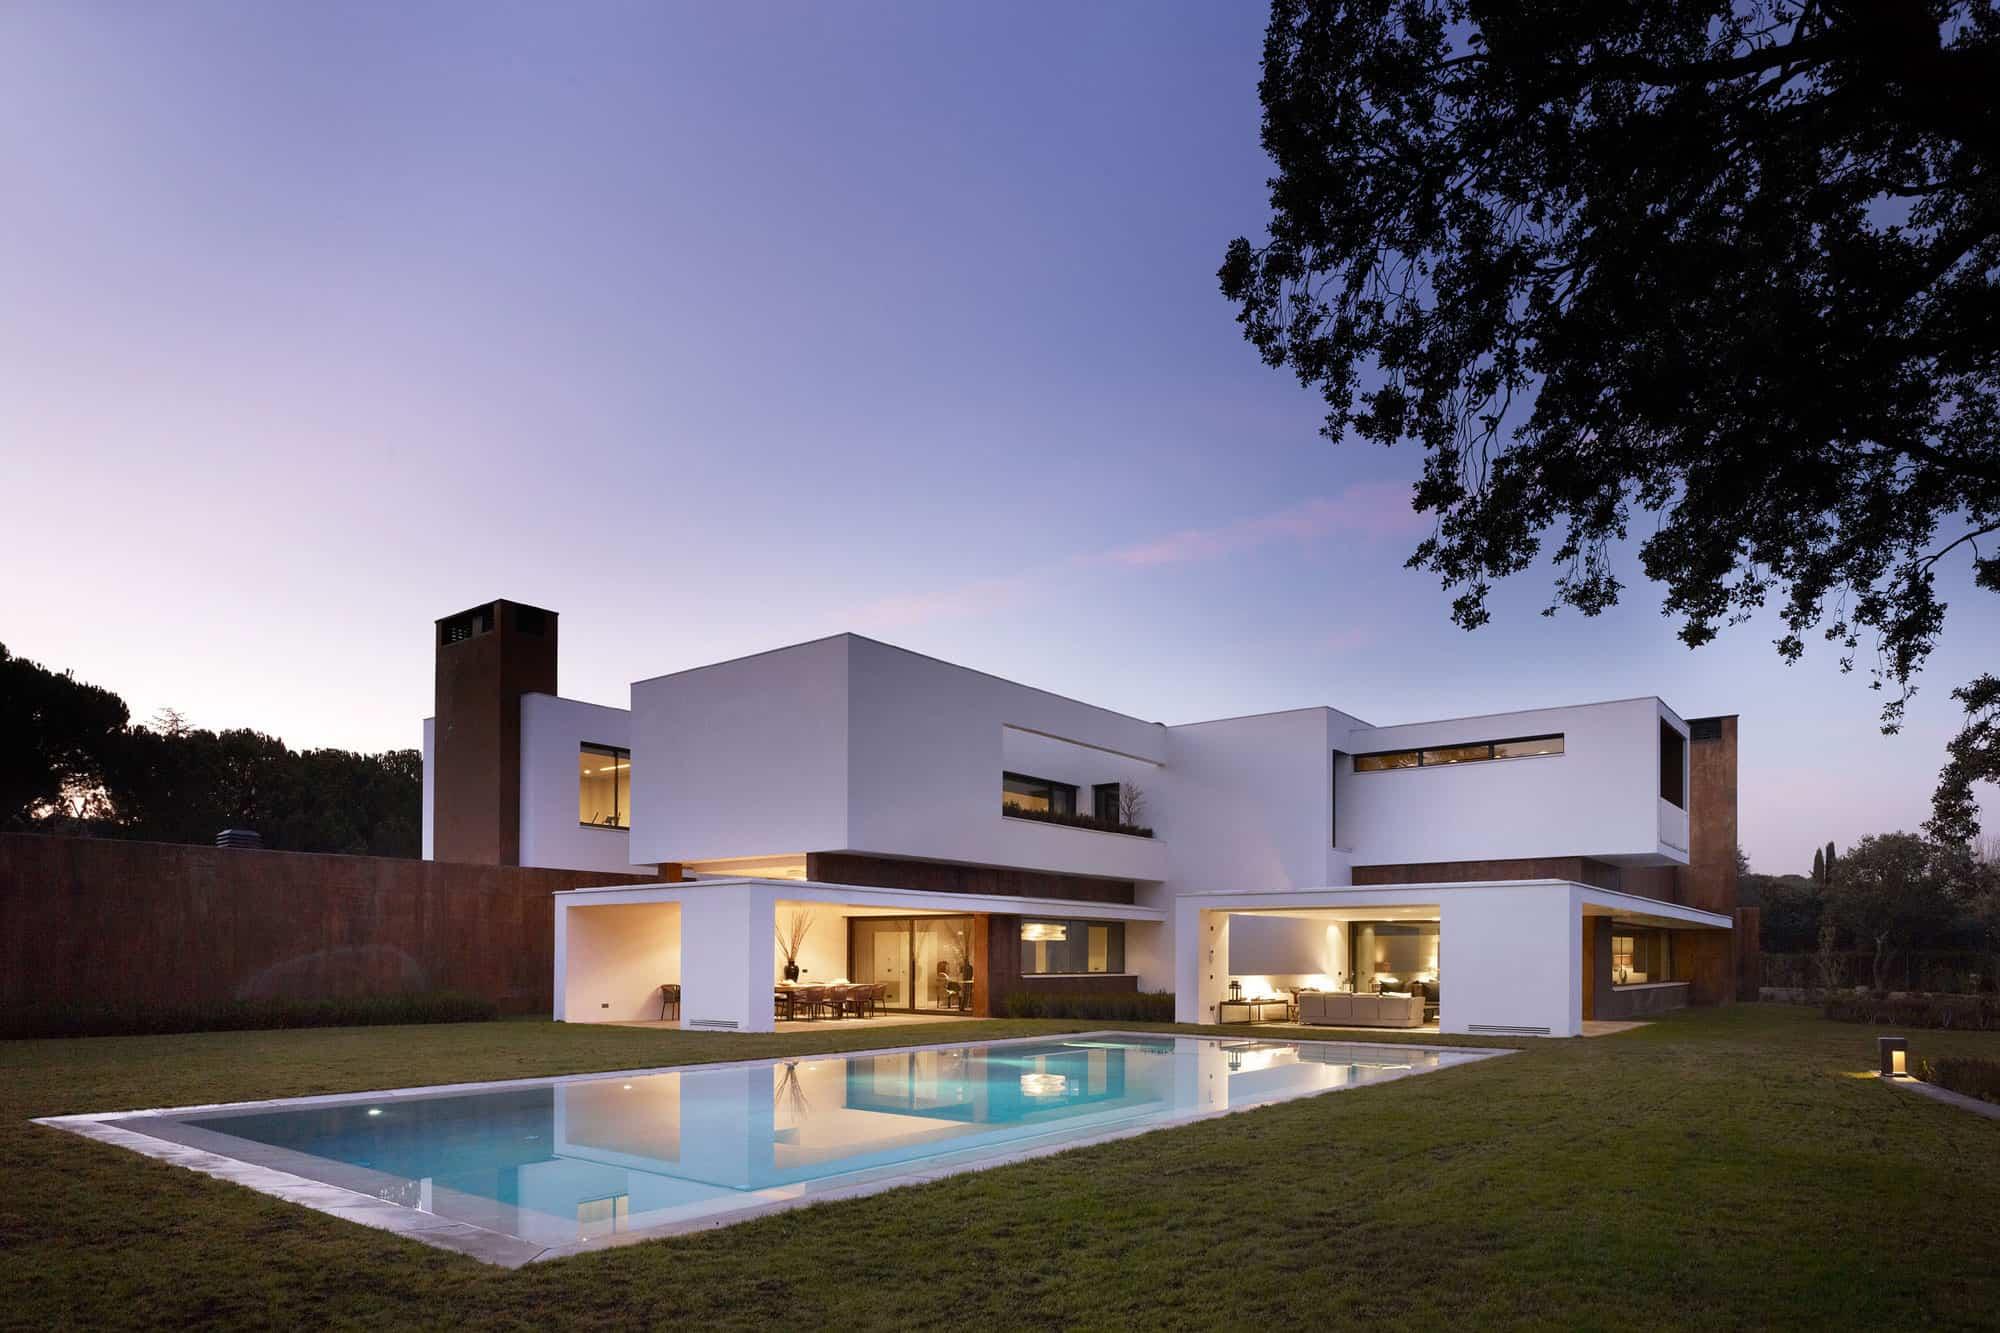 House in La Moraleja by Dahl Architects + GHG Architects